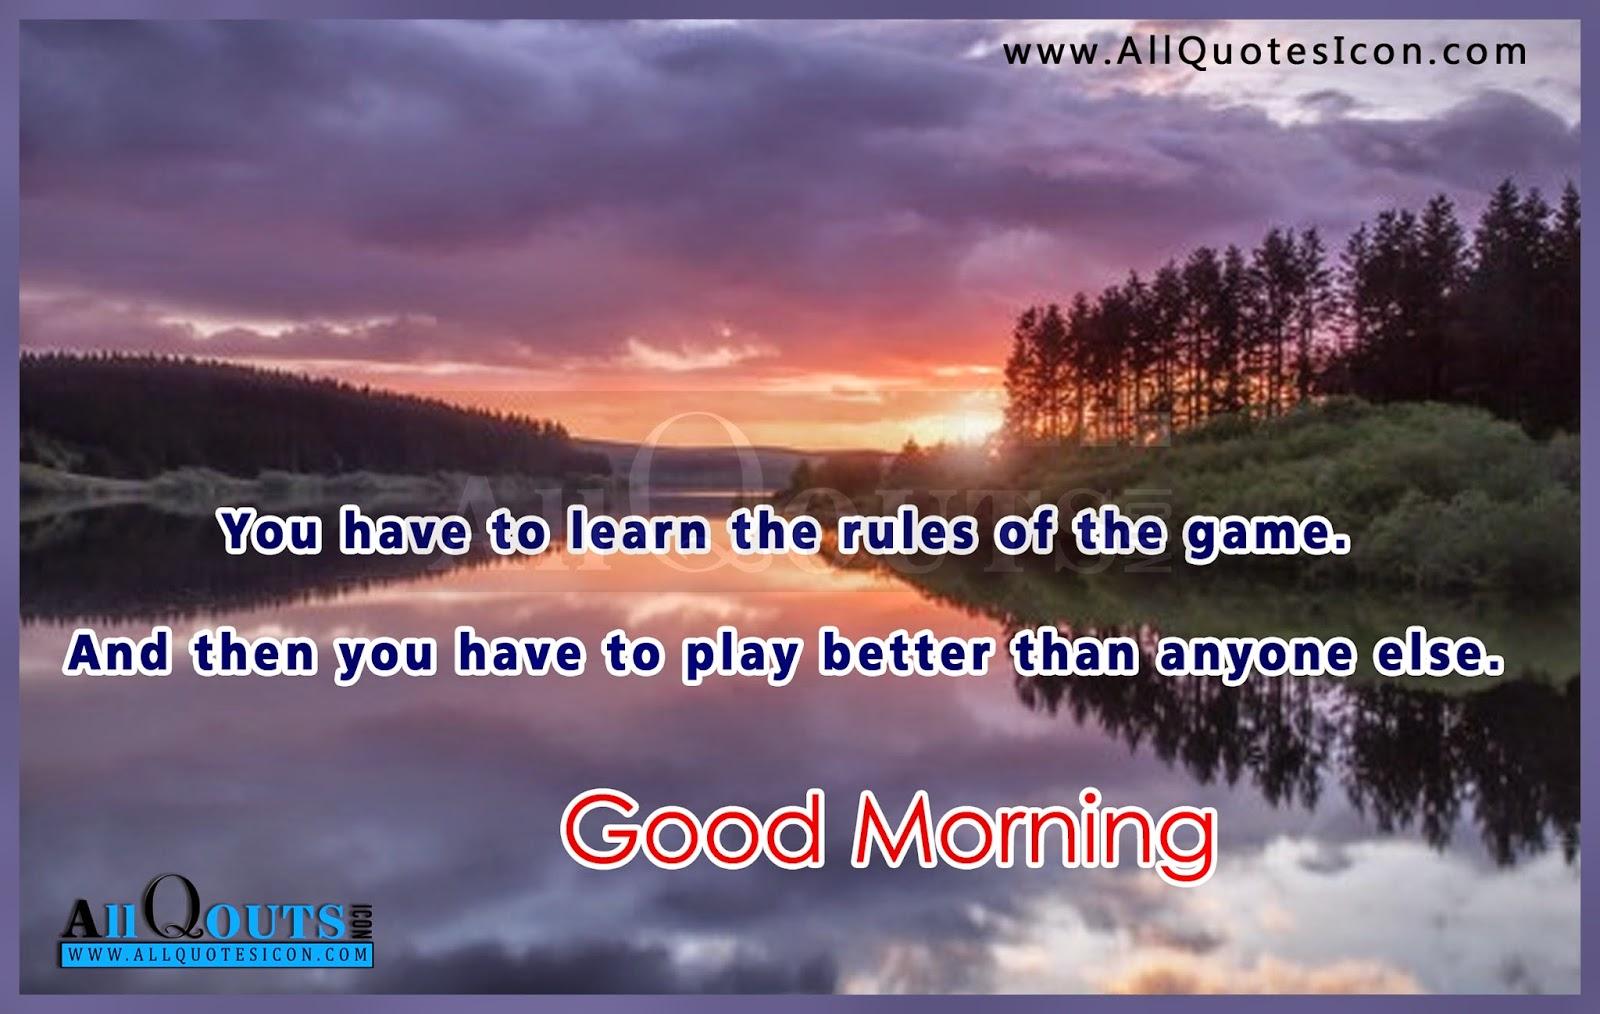 Good Morning Greetings In English Allquotesicon Telugu